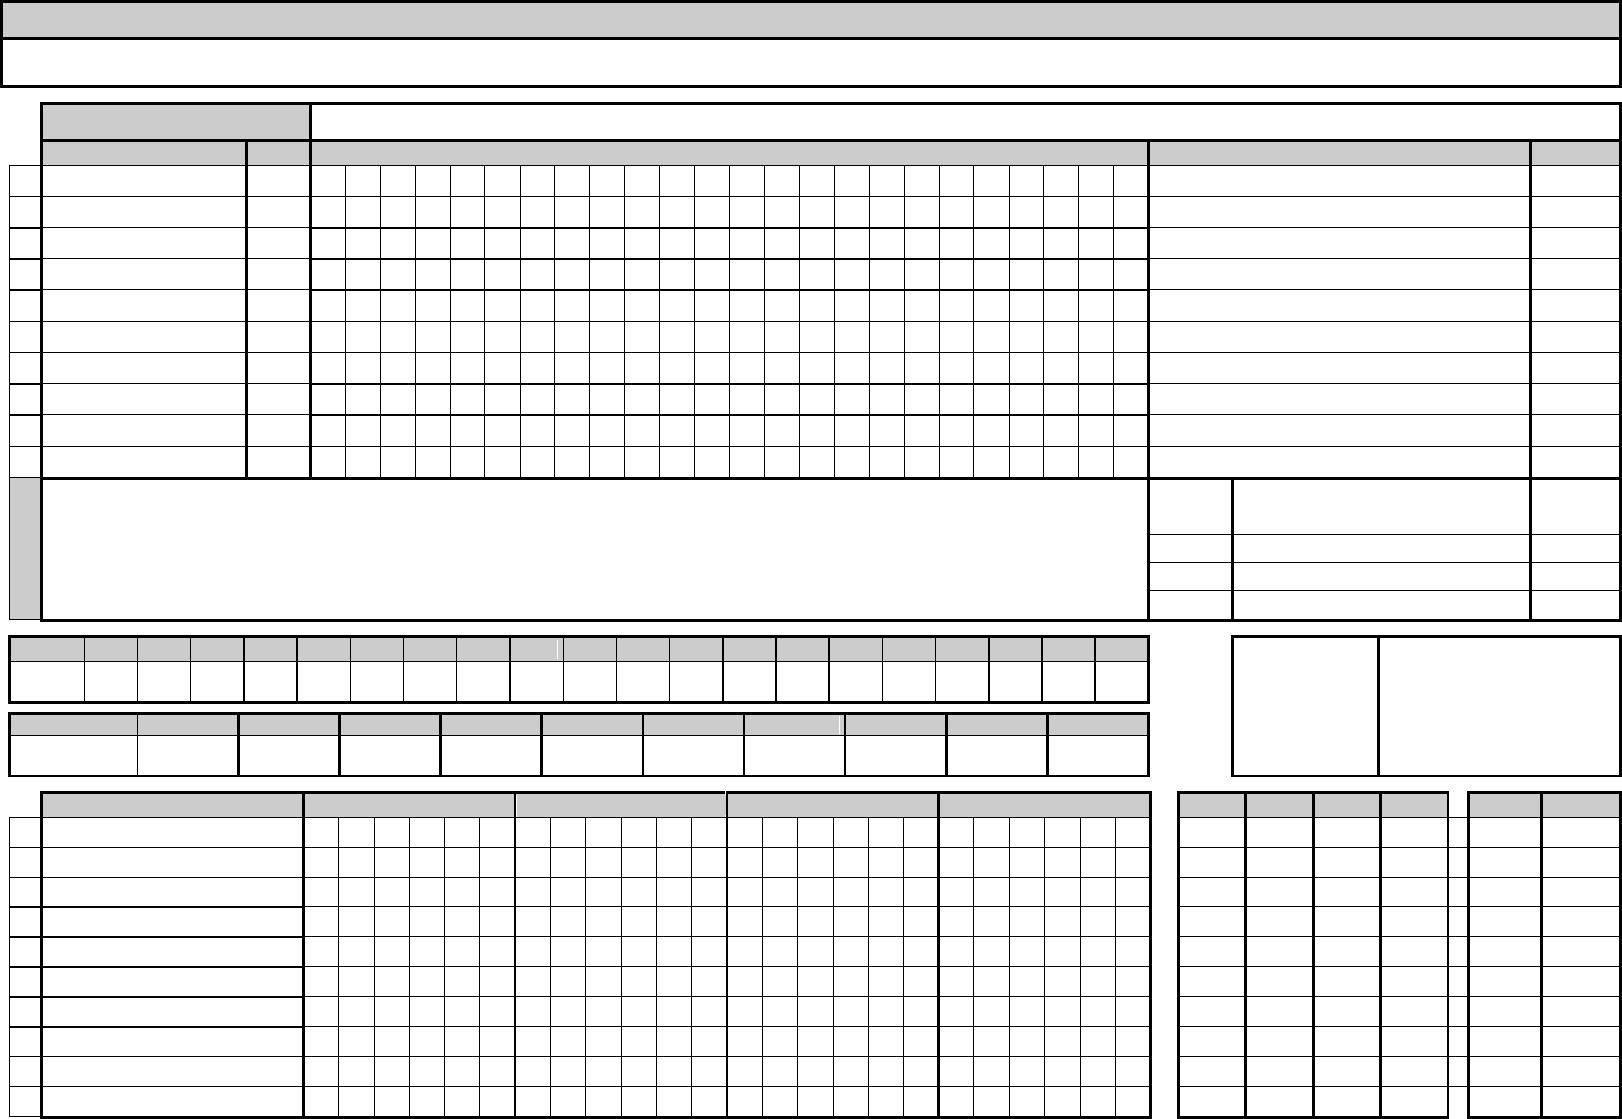 Cricket Score Sheet   Download Cricket Score Sheet 2 For Free Tidytemplates